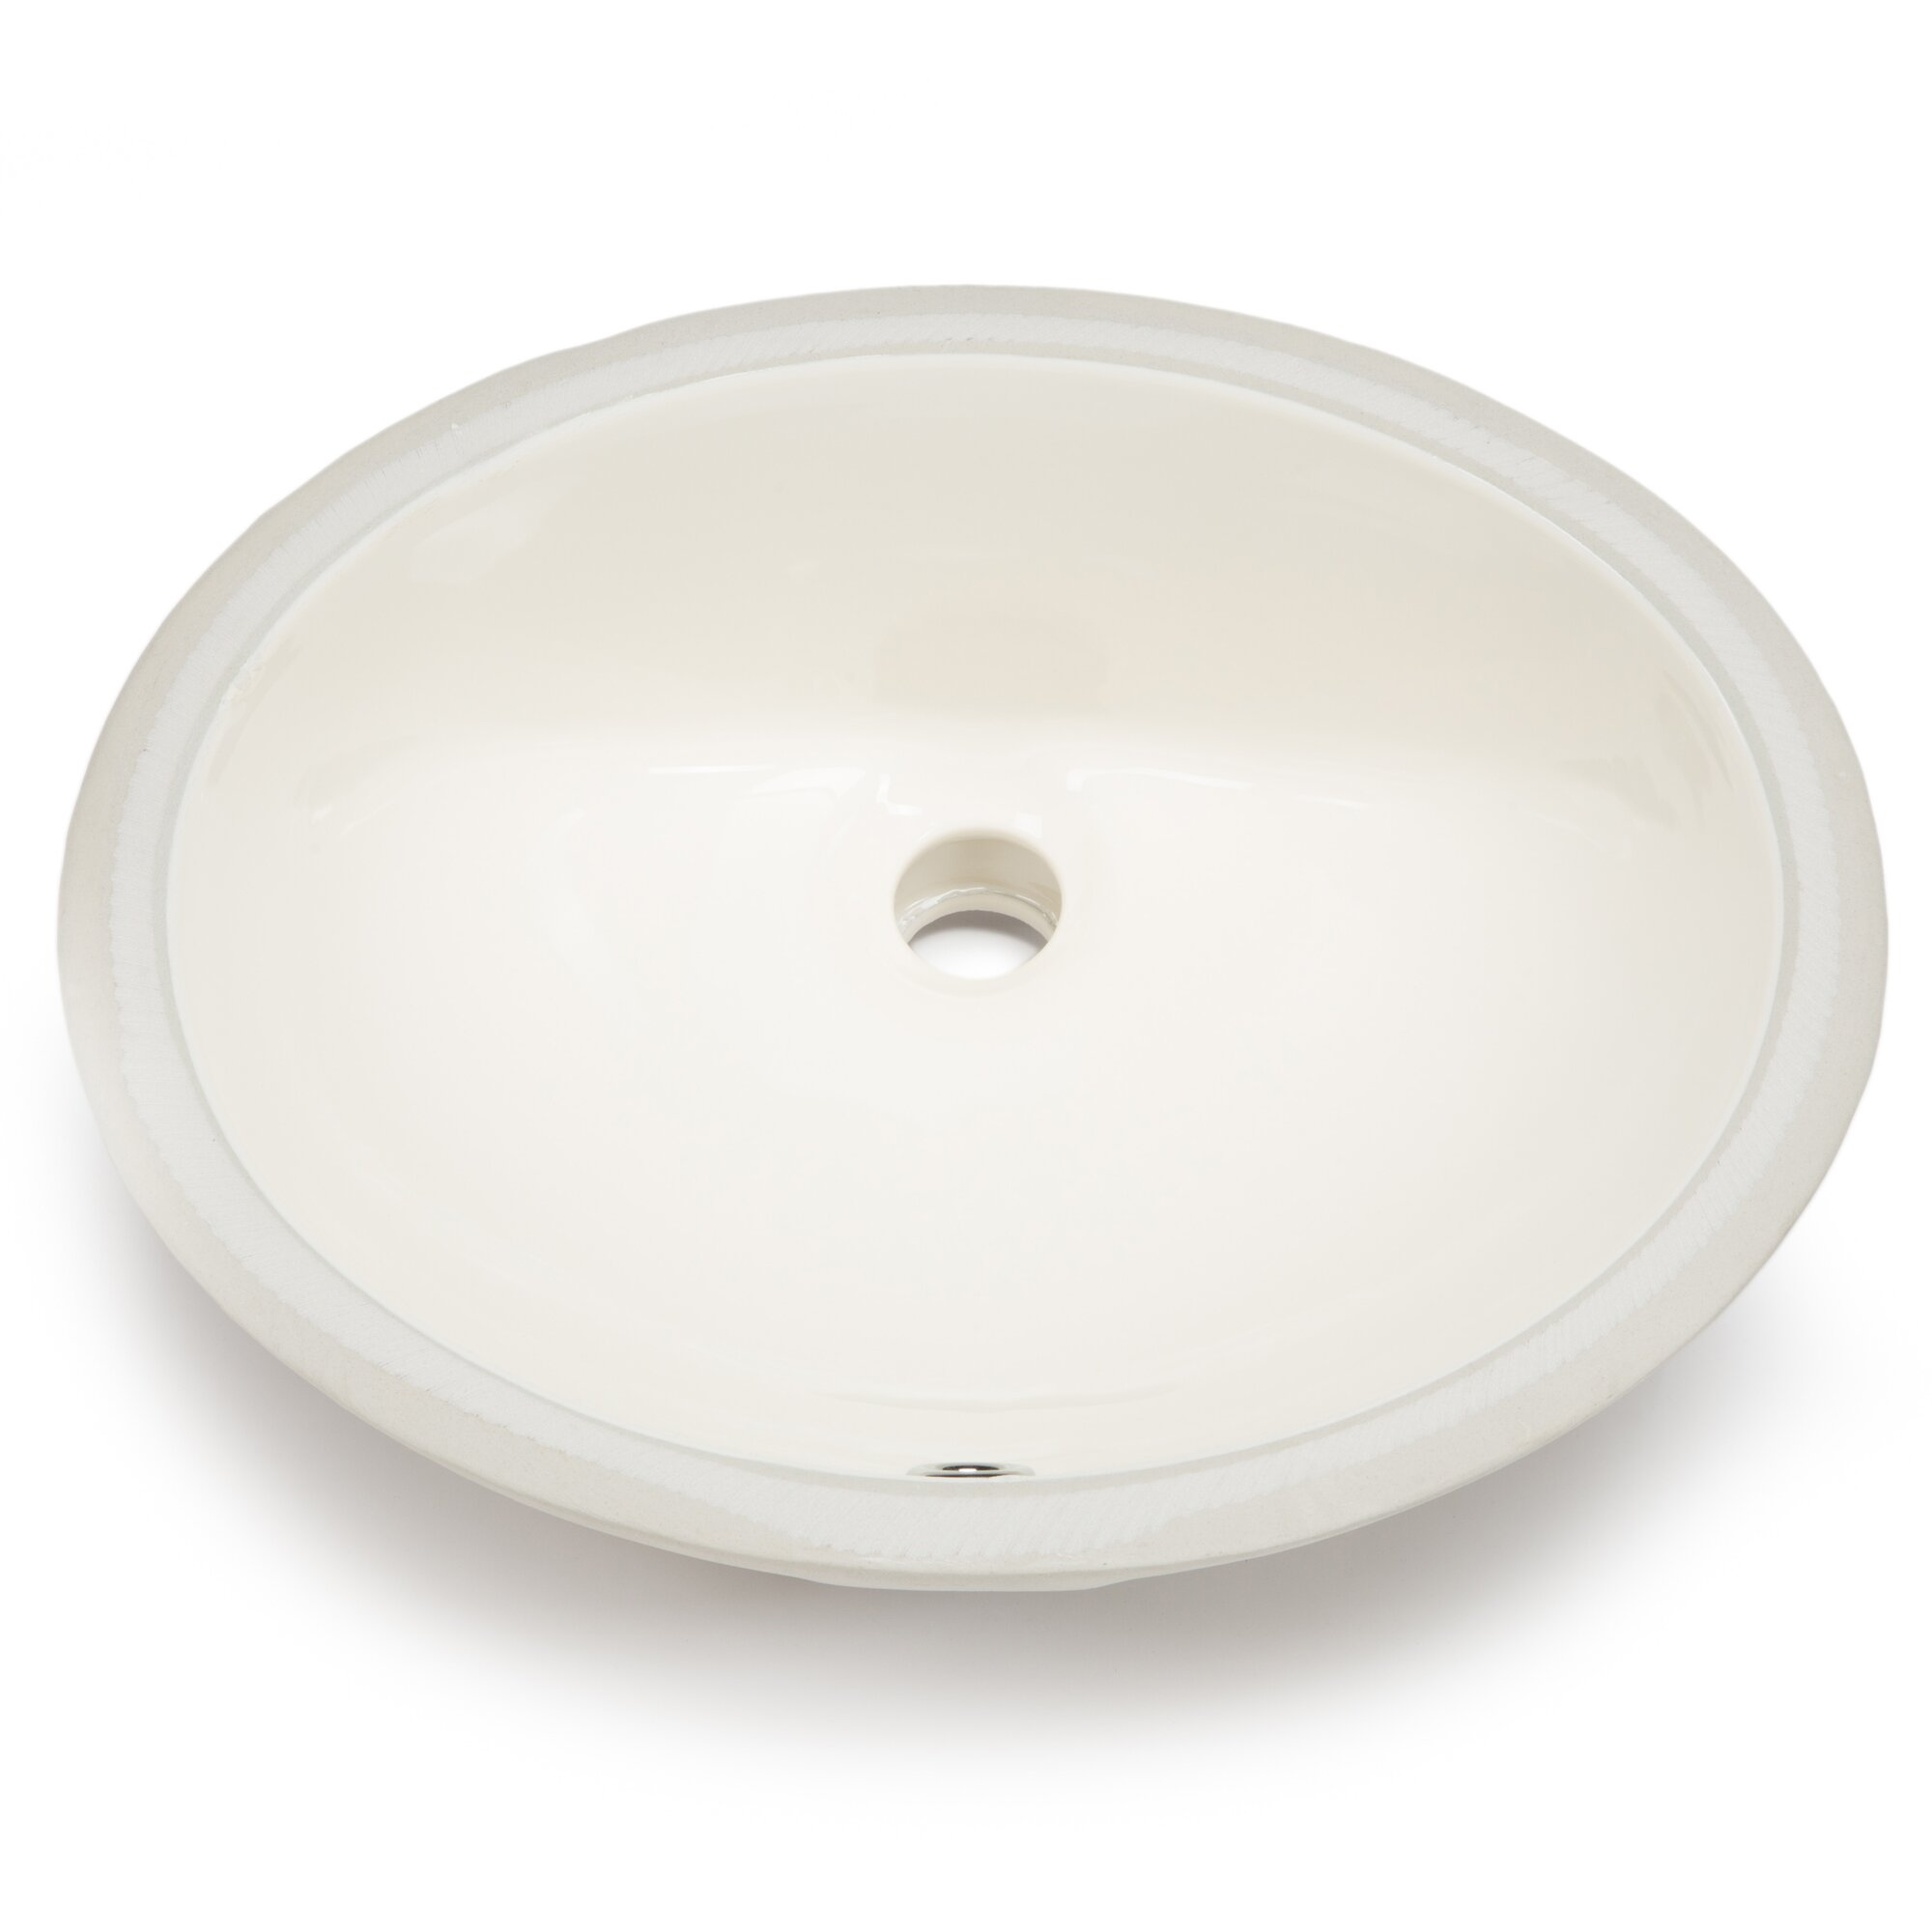 Hahn ceramic bowl oval undermount bathroom sink with overflow reviews wayfair Undermount bathroom sink bowl